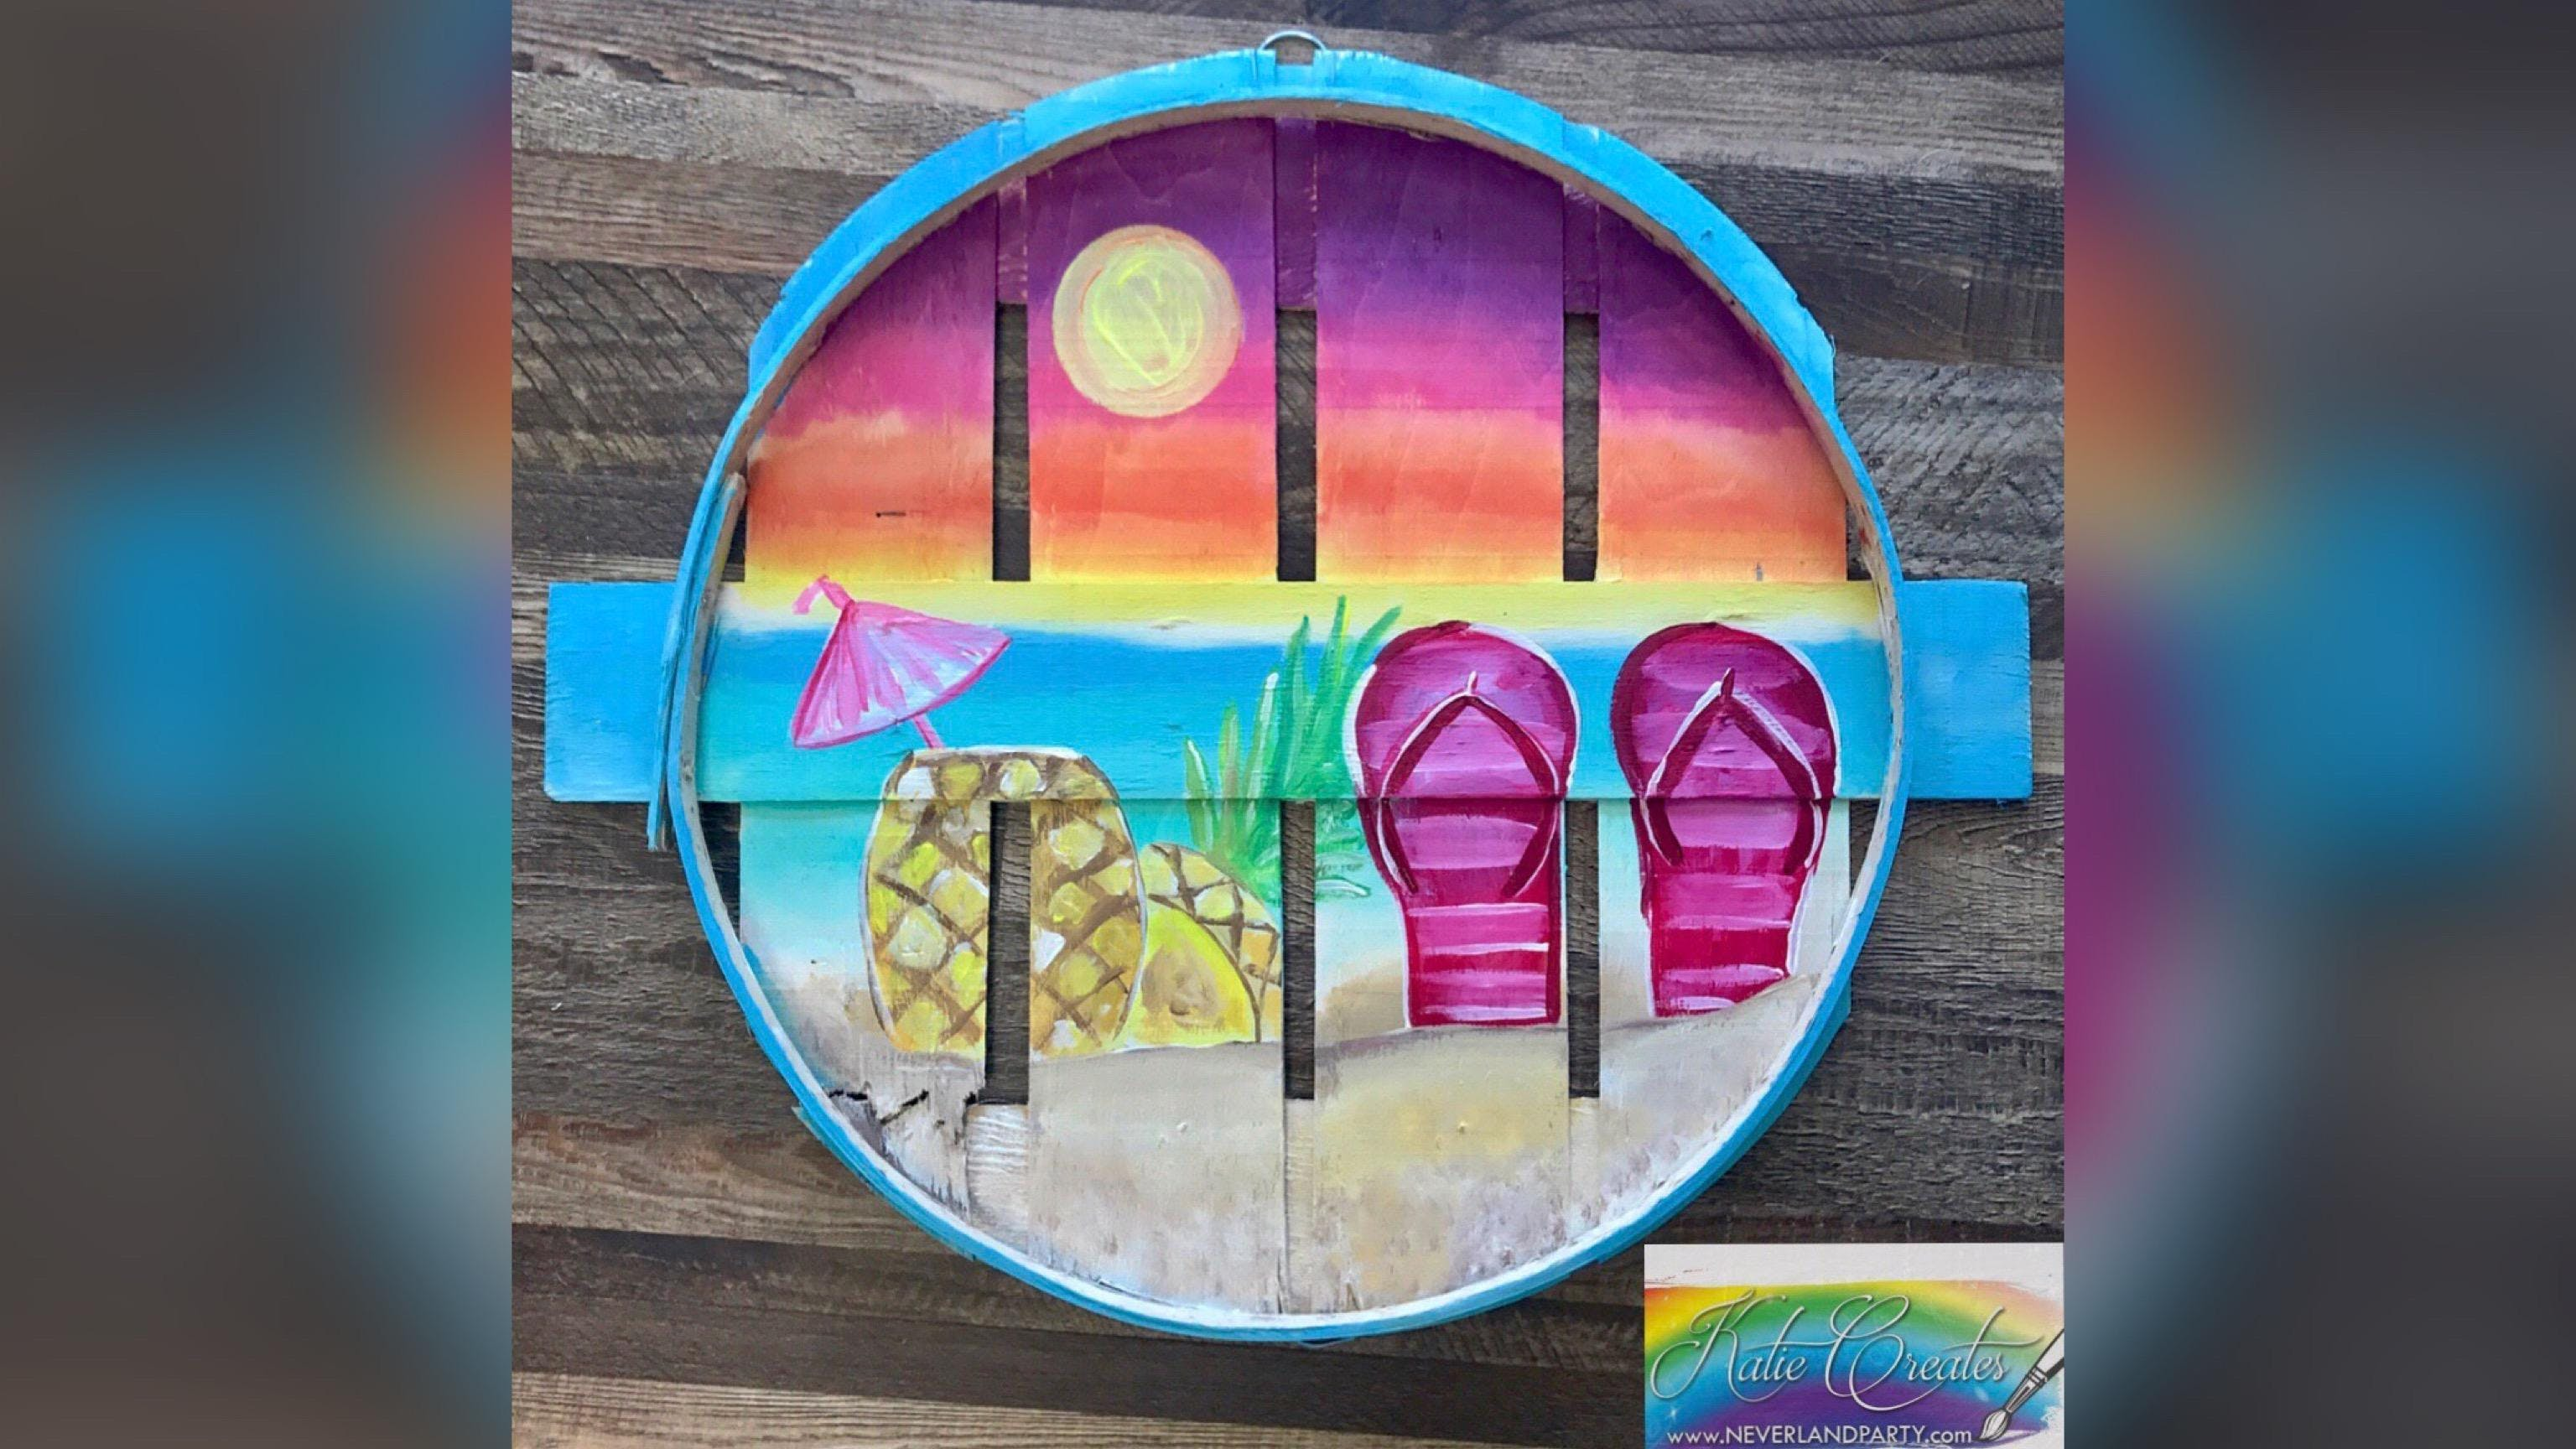 Tropical Beach Pasadena Pit Stop Pub With Artist Katie Detrich